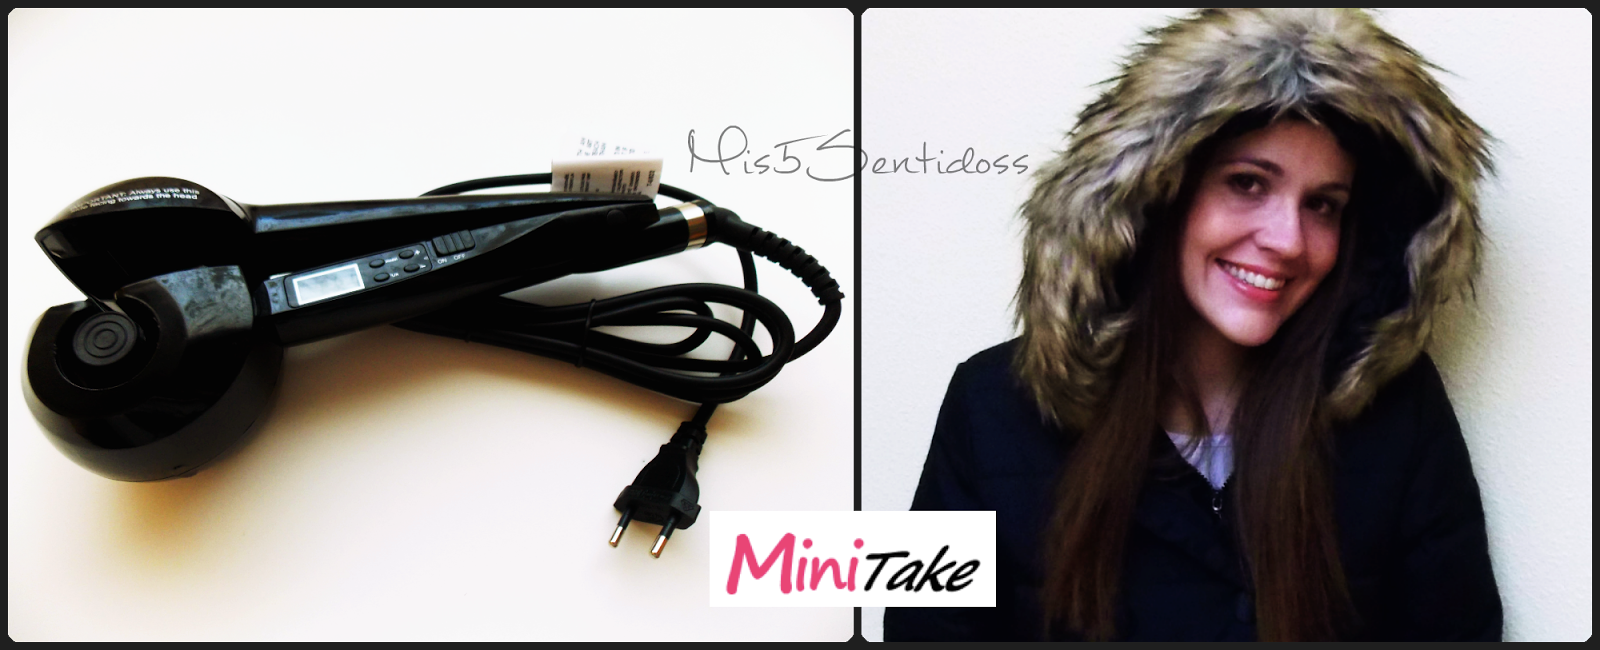 Minitake abrigo de plumas y rizador de pelo